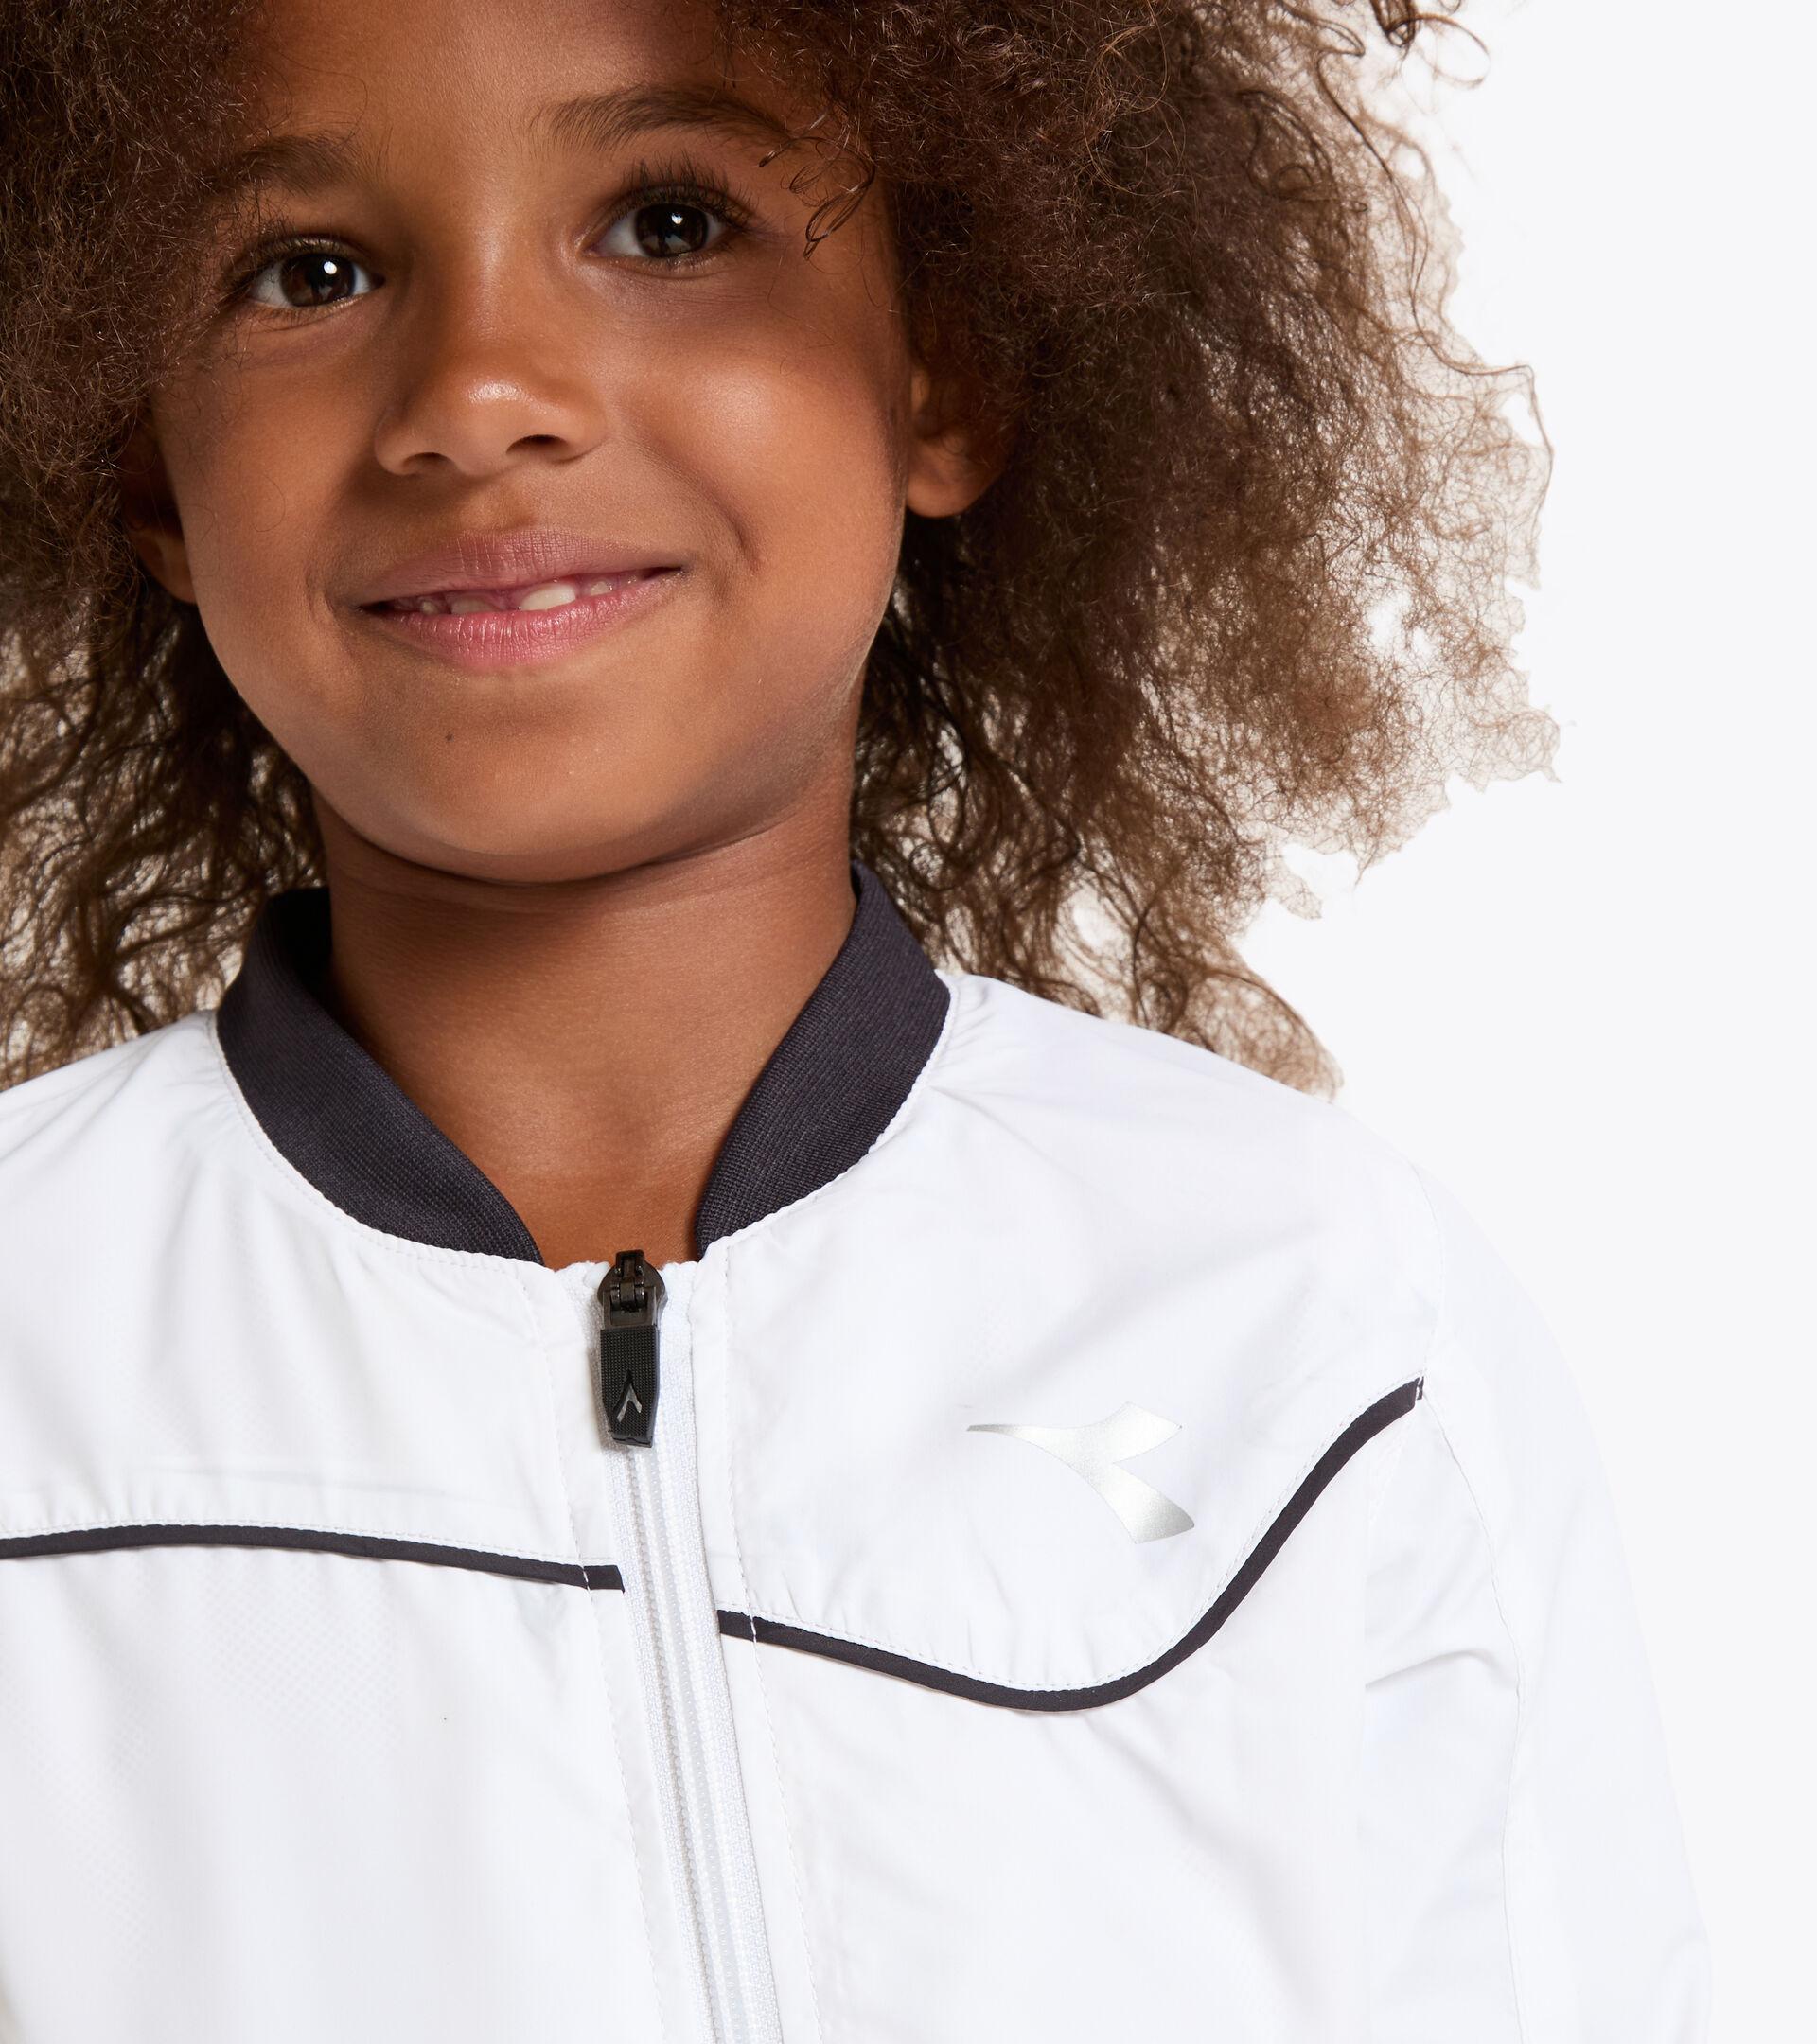 Chaqueta de tenis - Junior G. JACKET COURT BLANCO VIVO - Diadora